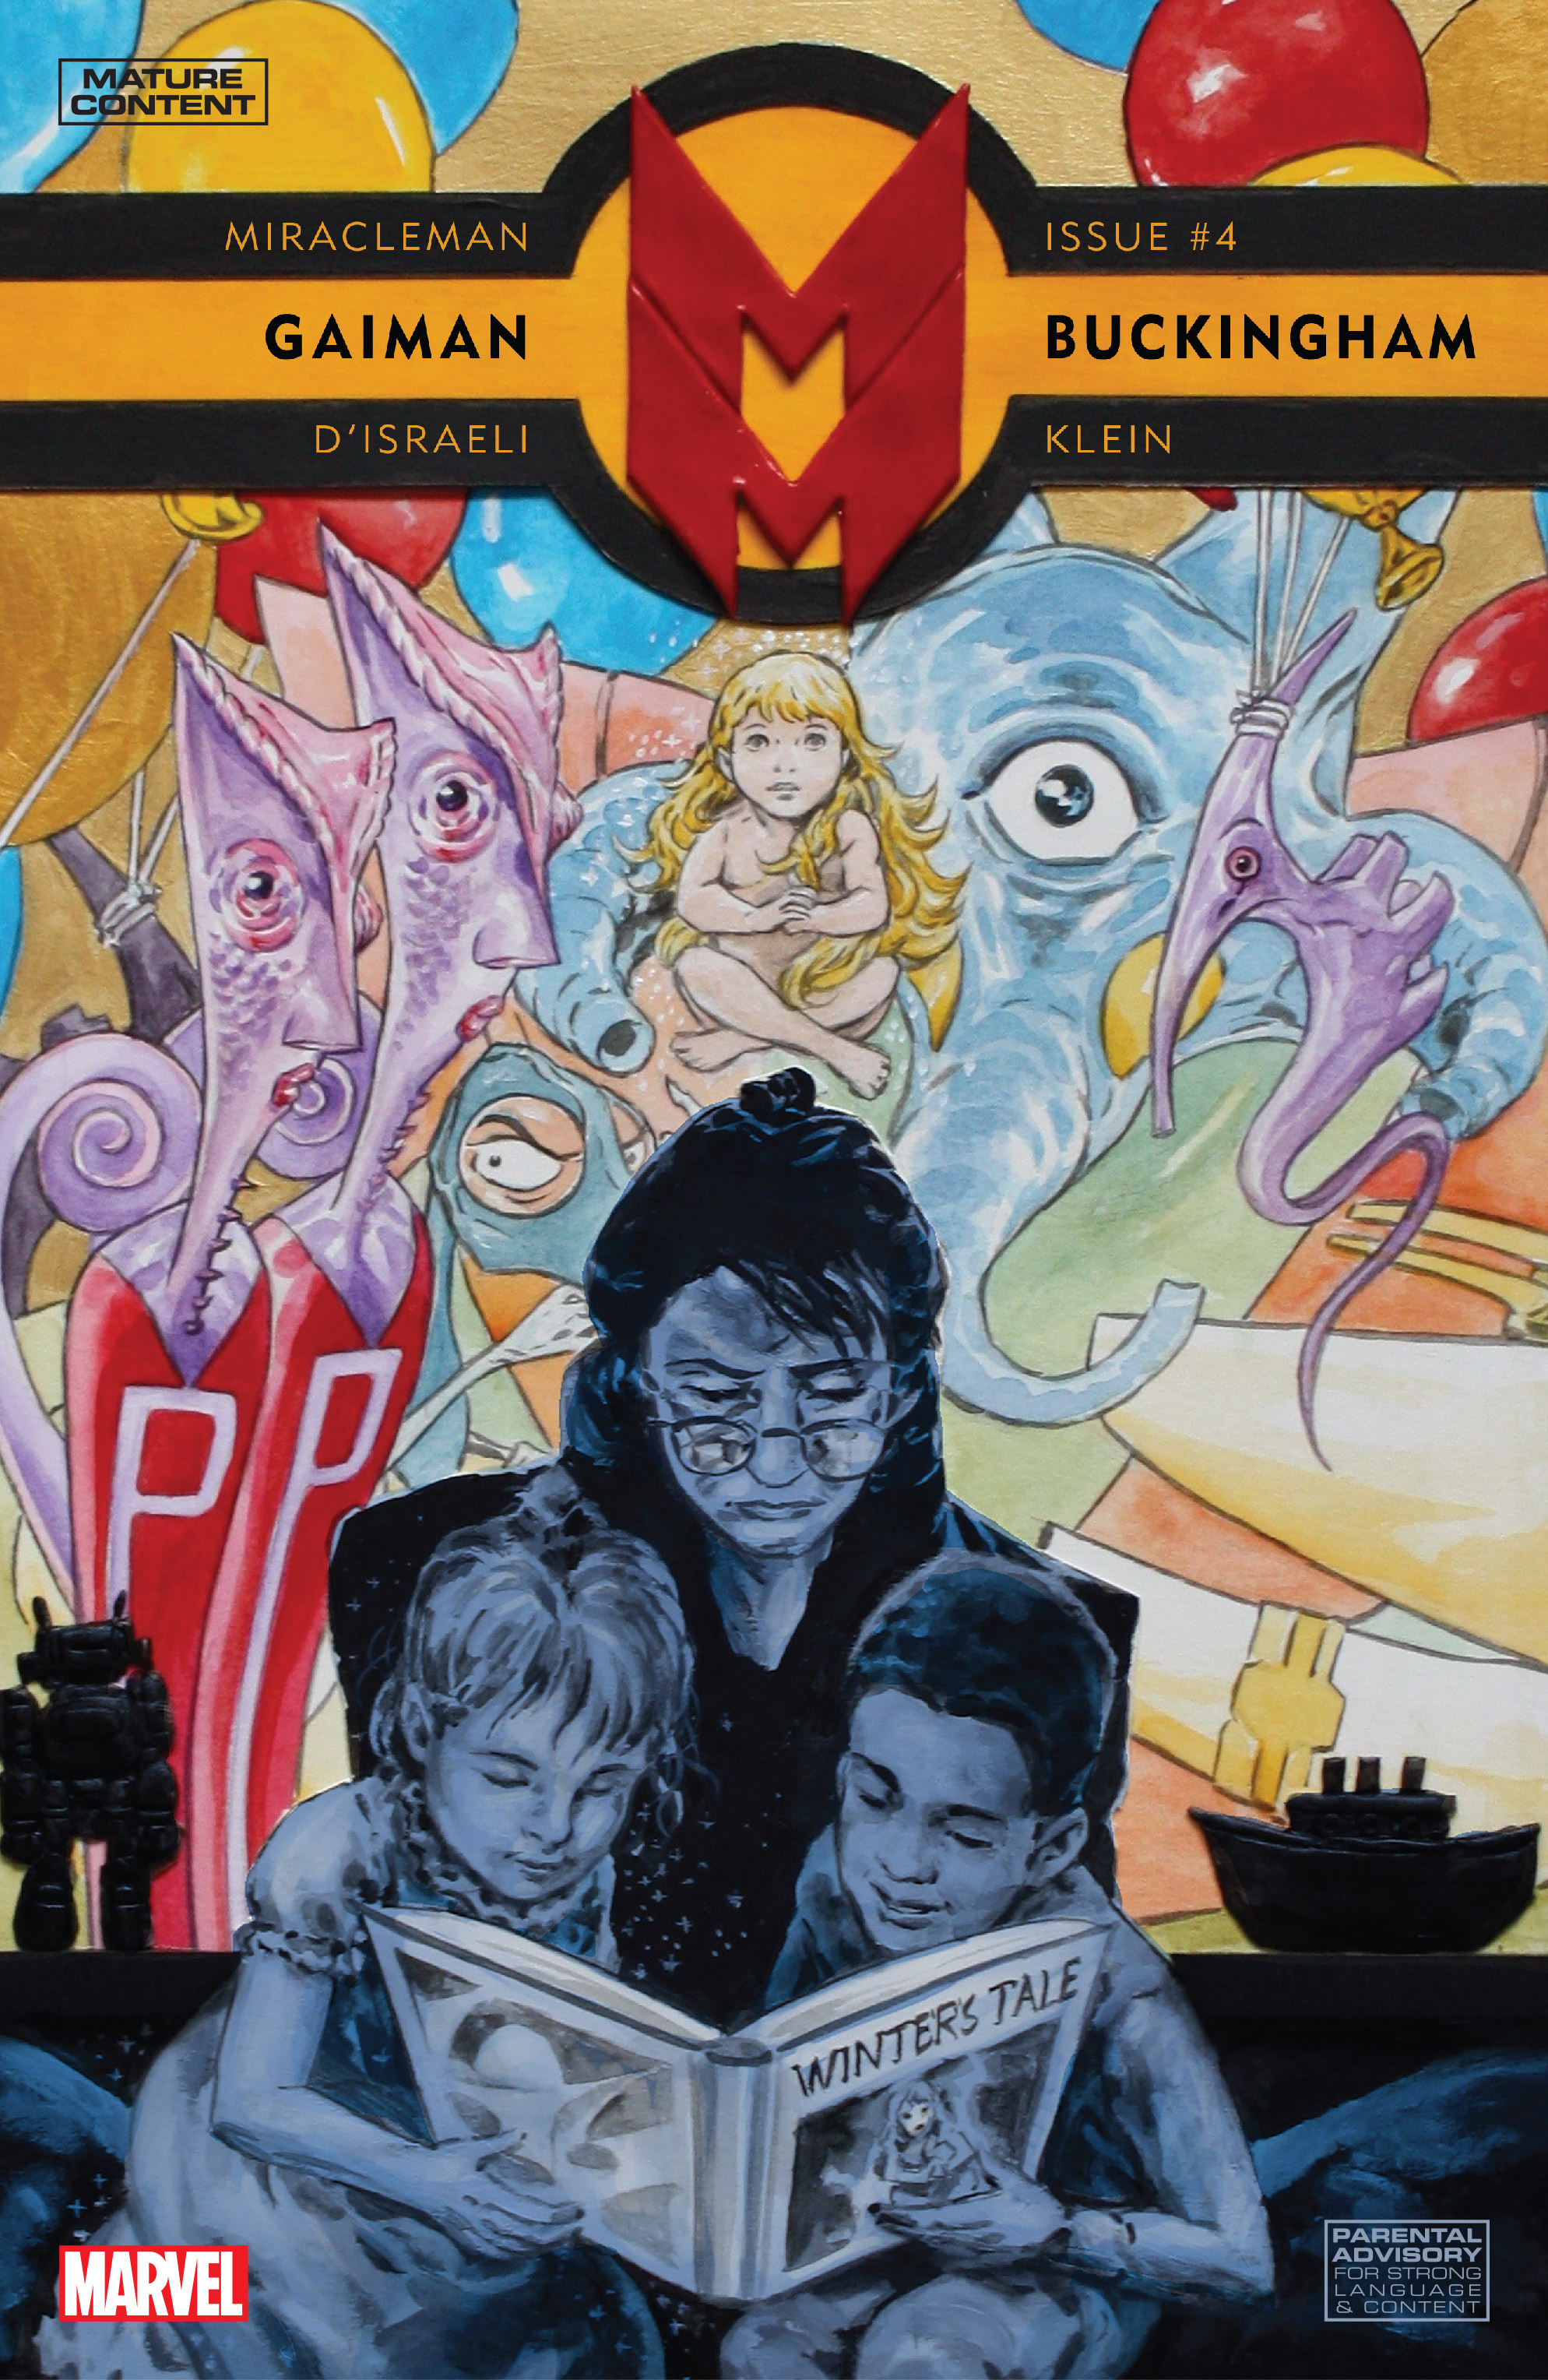 Miracleman by Gaiman & Buckingham Vol 1 4